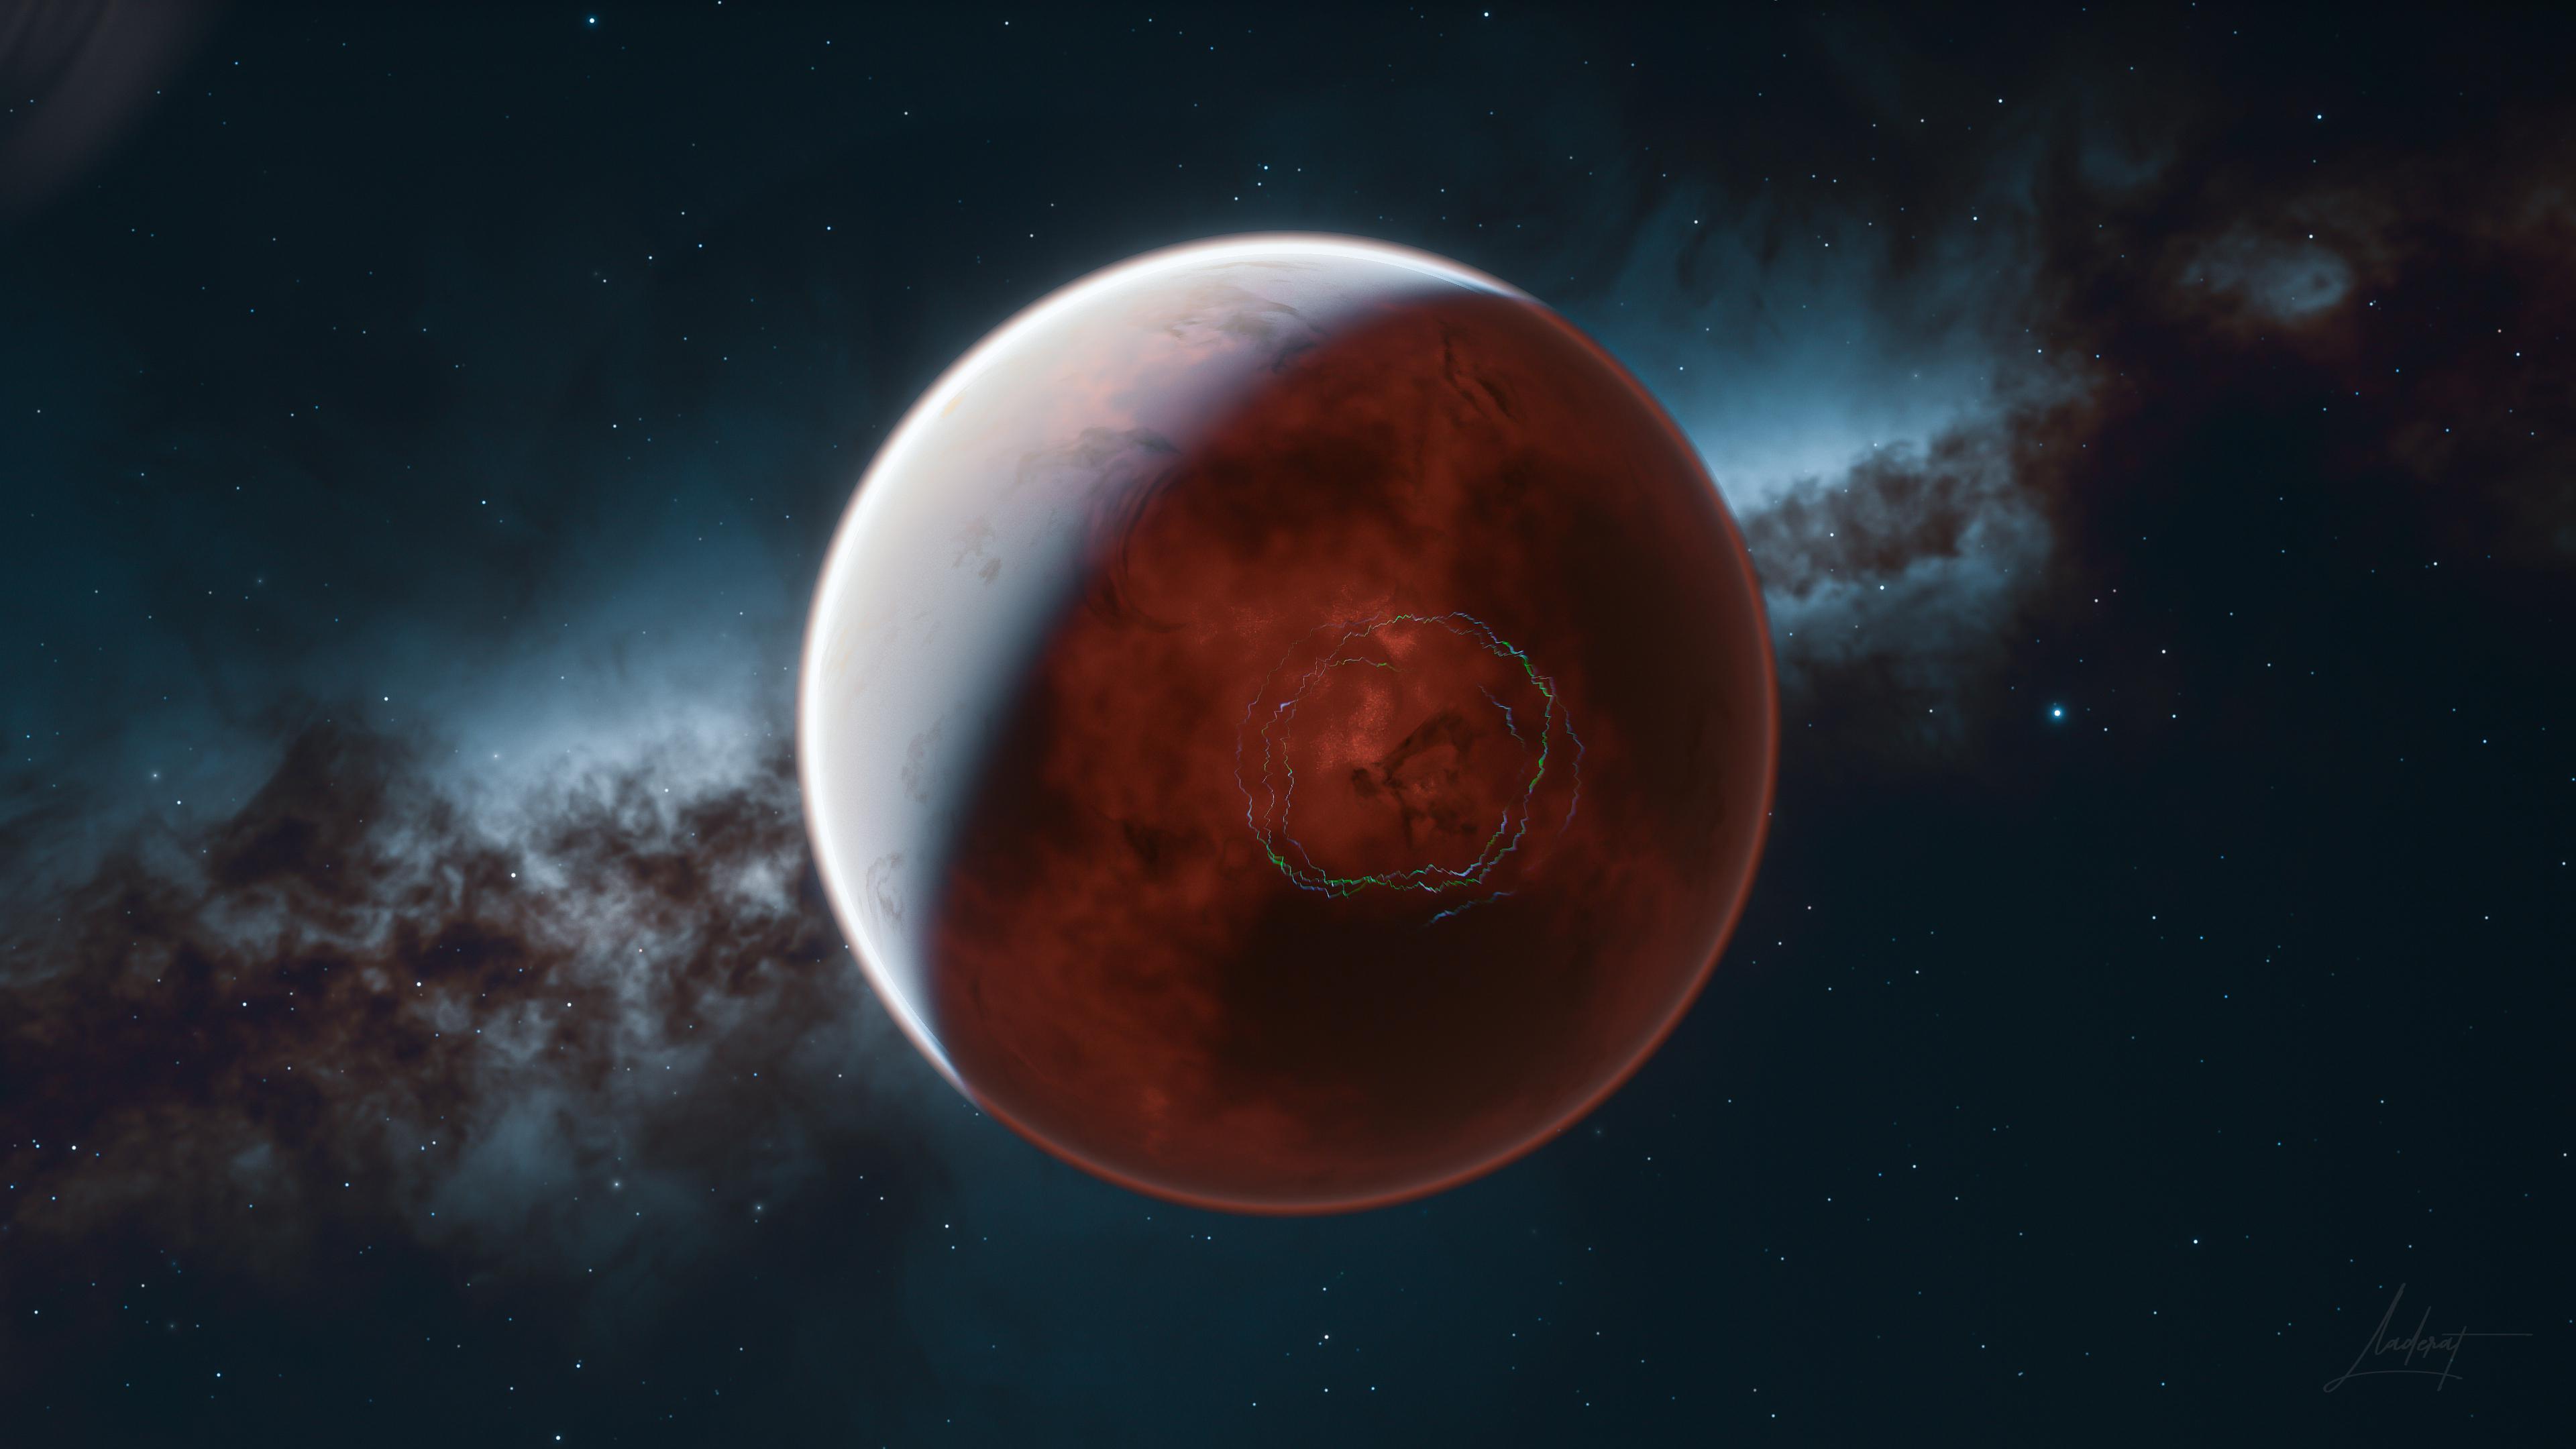 General 3840x2160 planet space nebula atmosphere Milky Way Space Engine screen shot stars aurorae